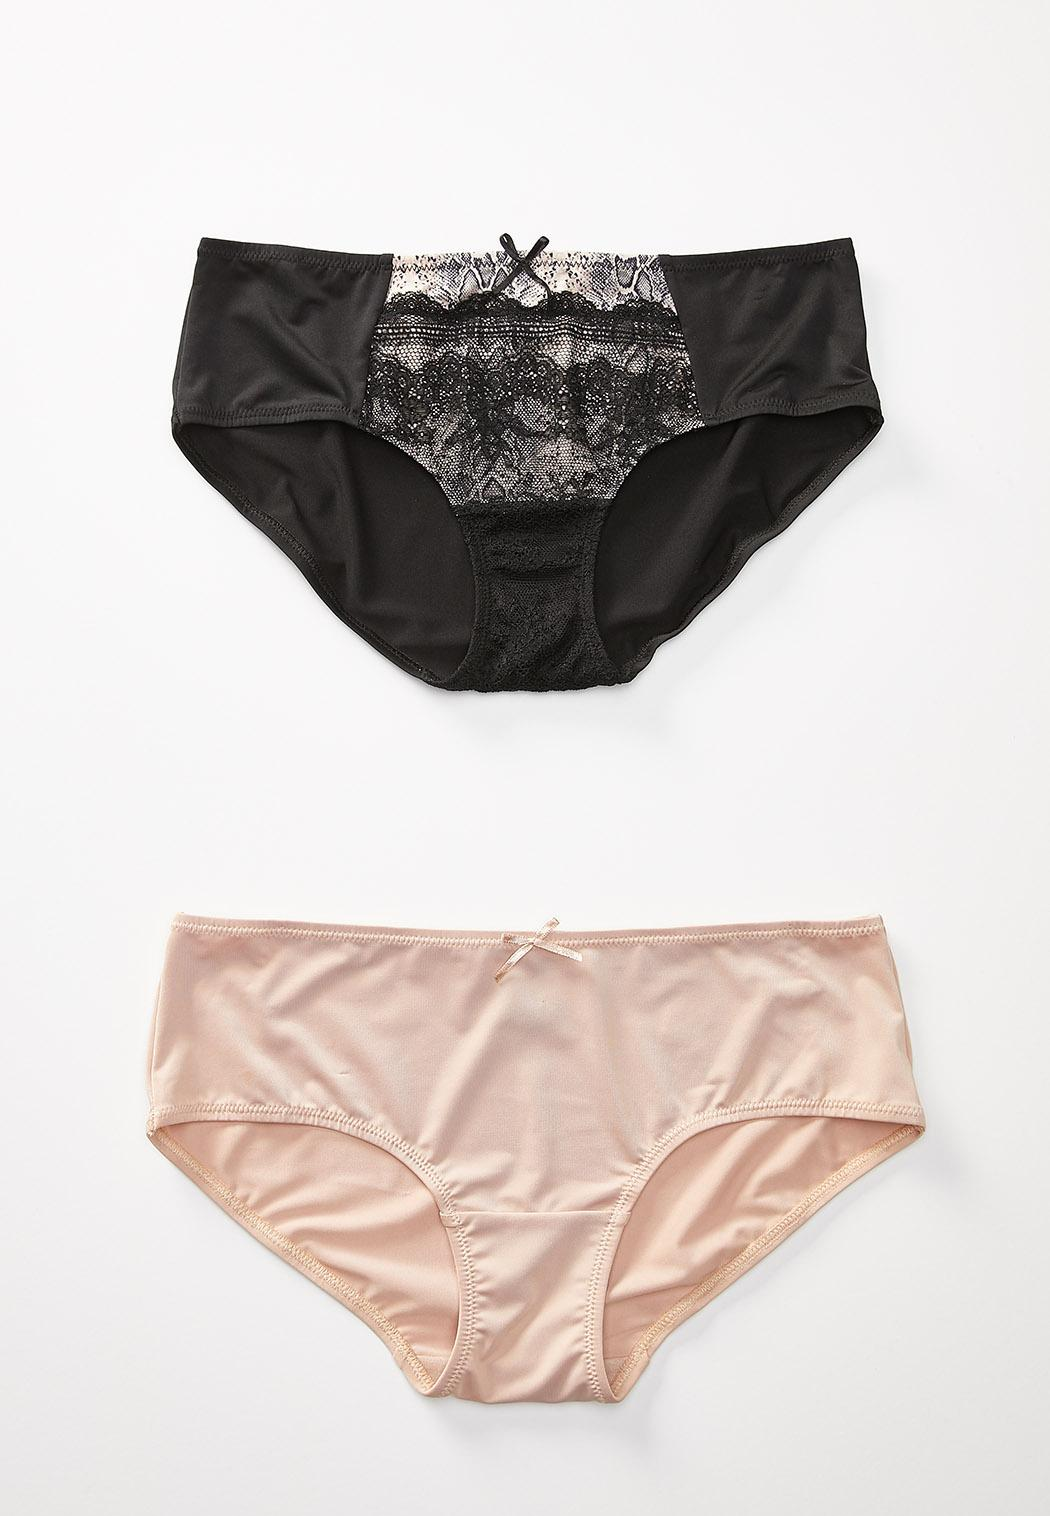 Plus Size Lacey Snakeskin Panty Set